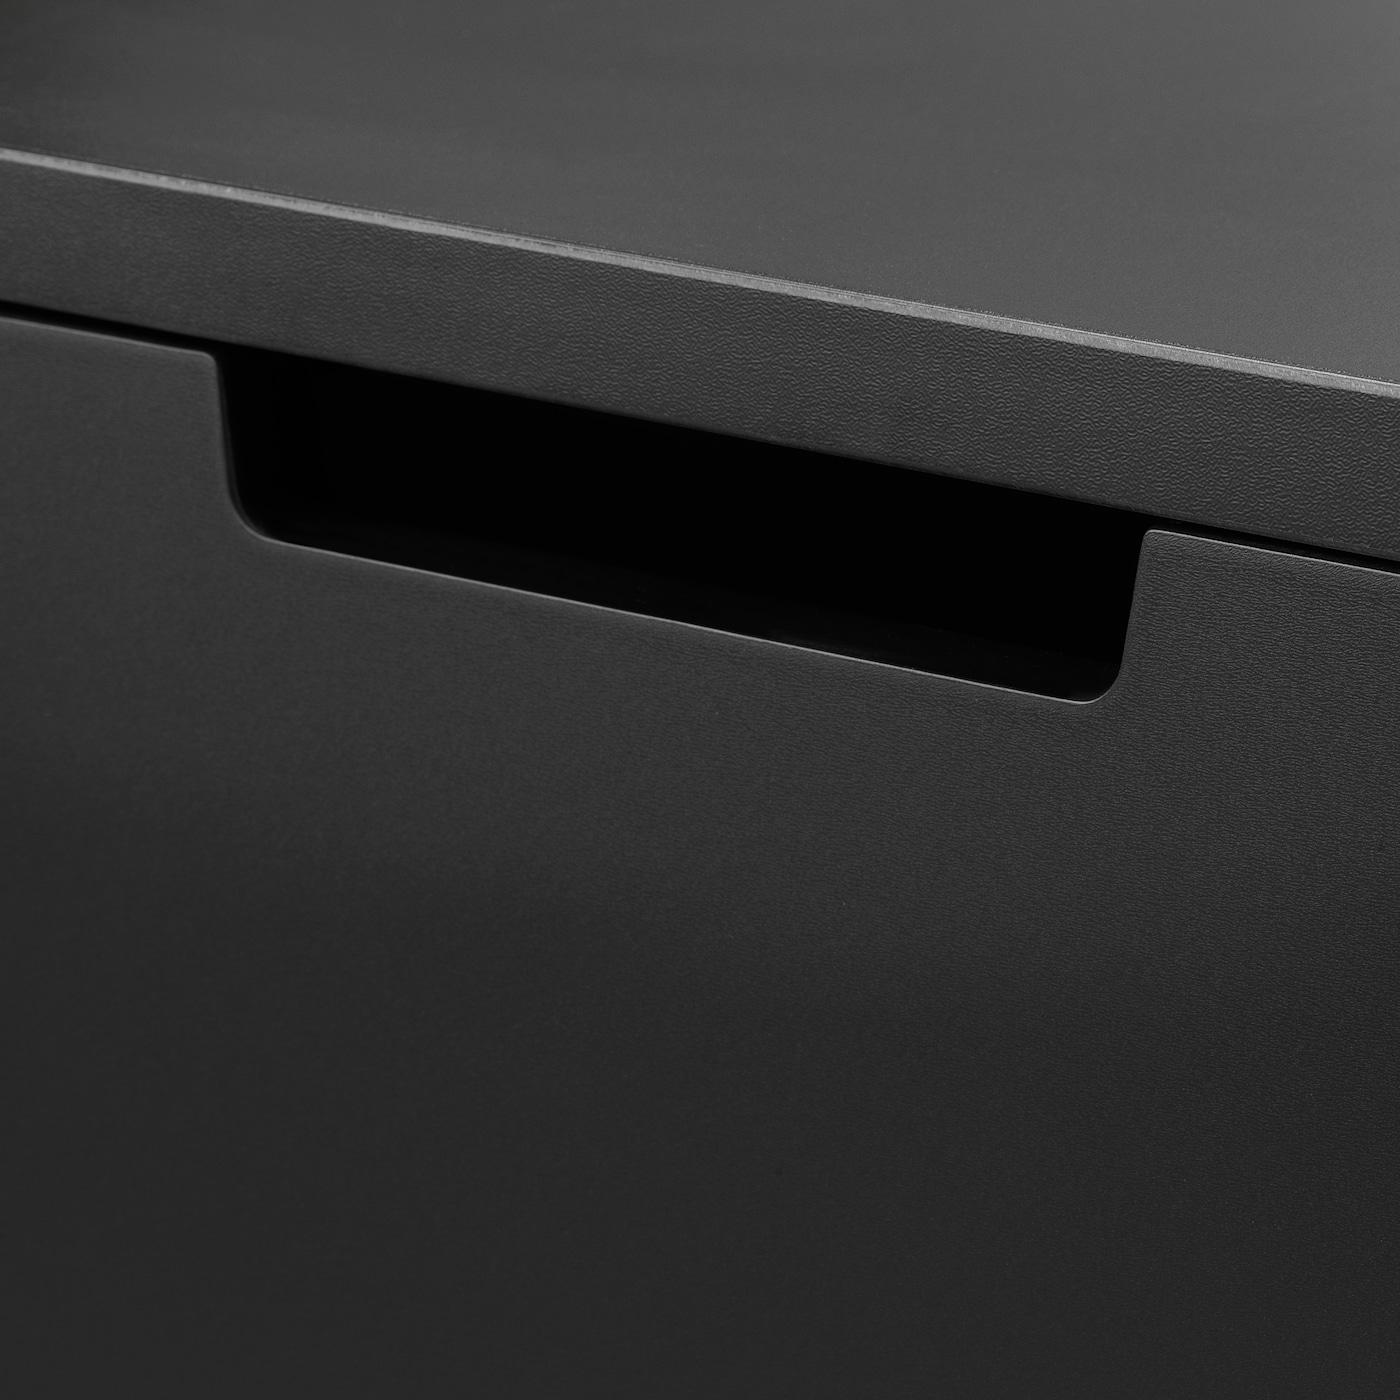 NORDLI Cómoda c/6 gavetas - antracite 120x54 cm